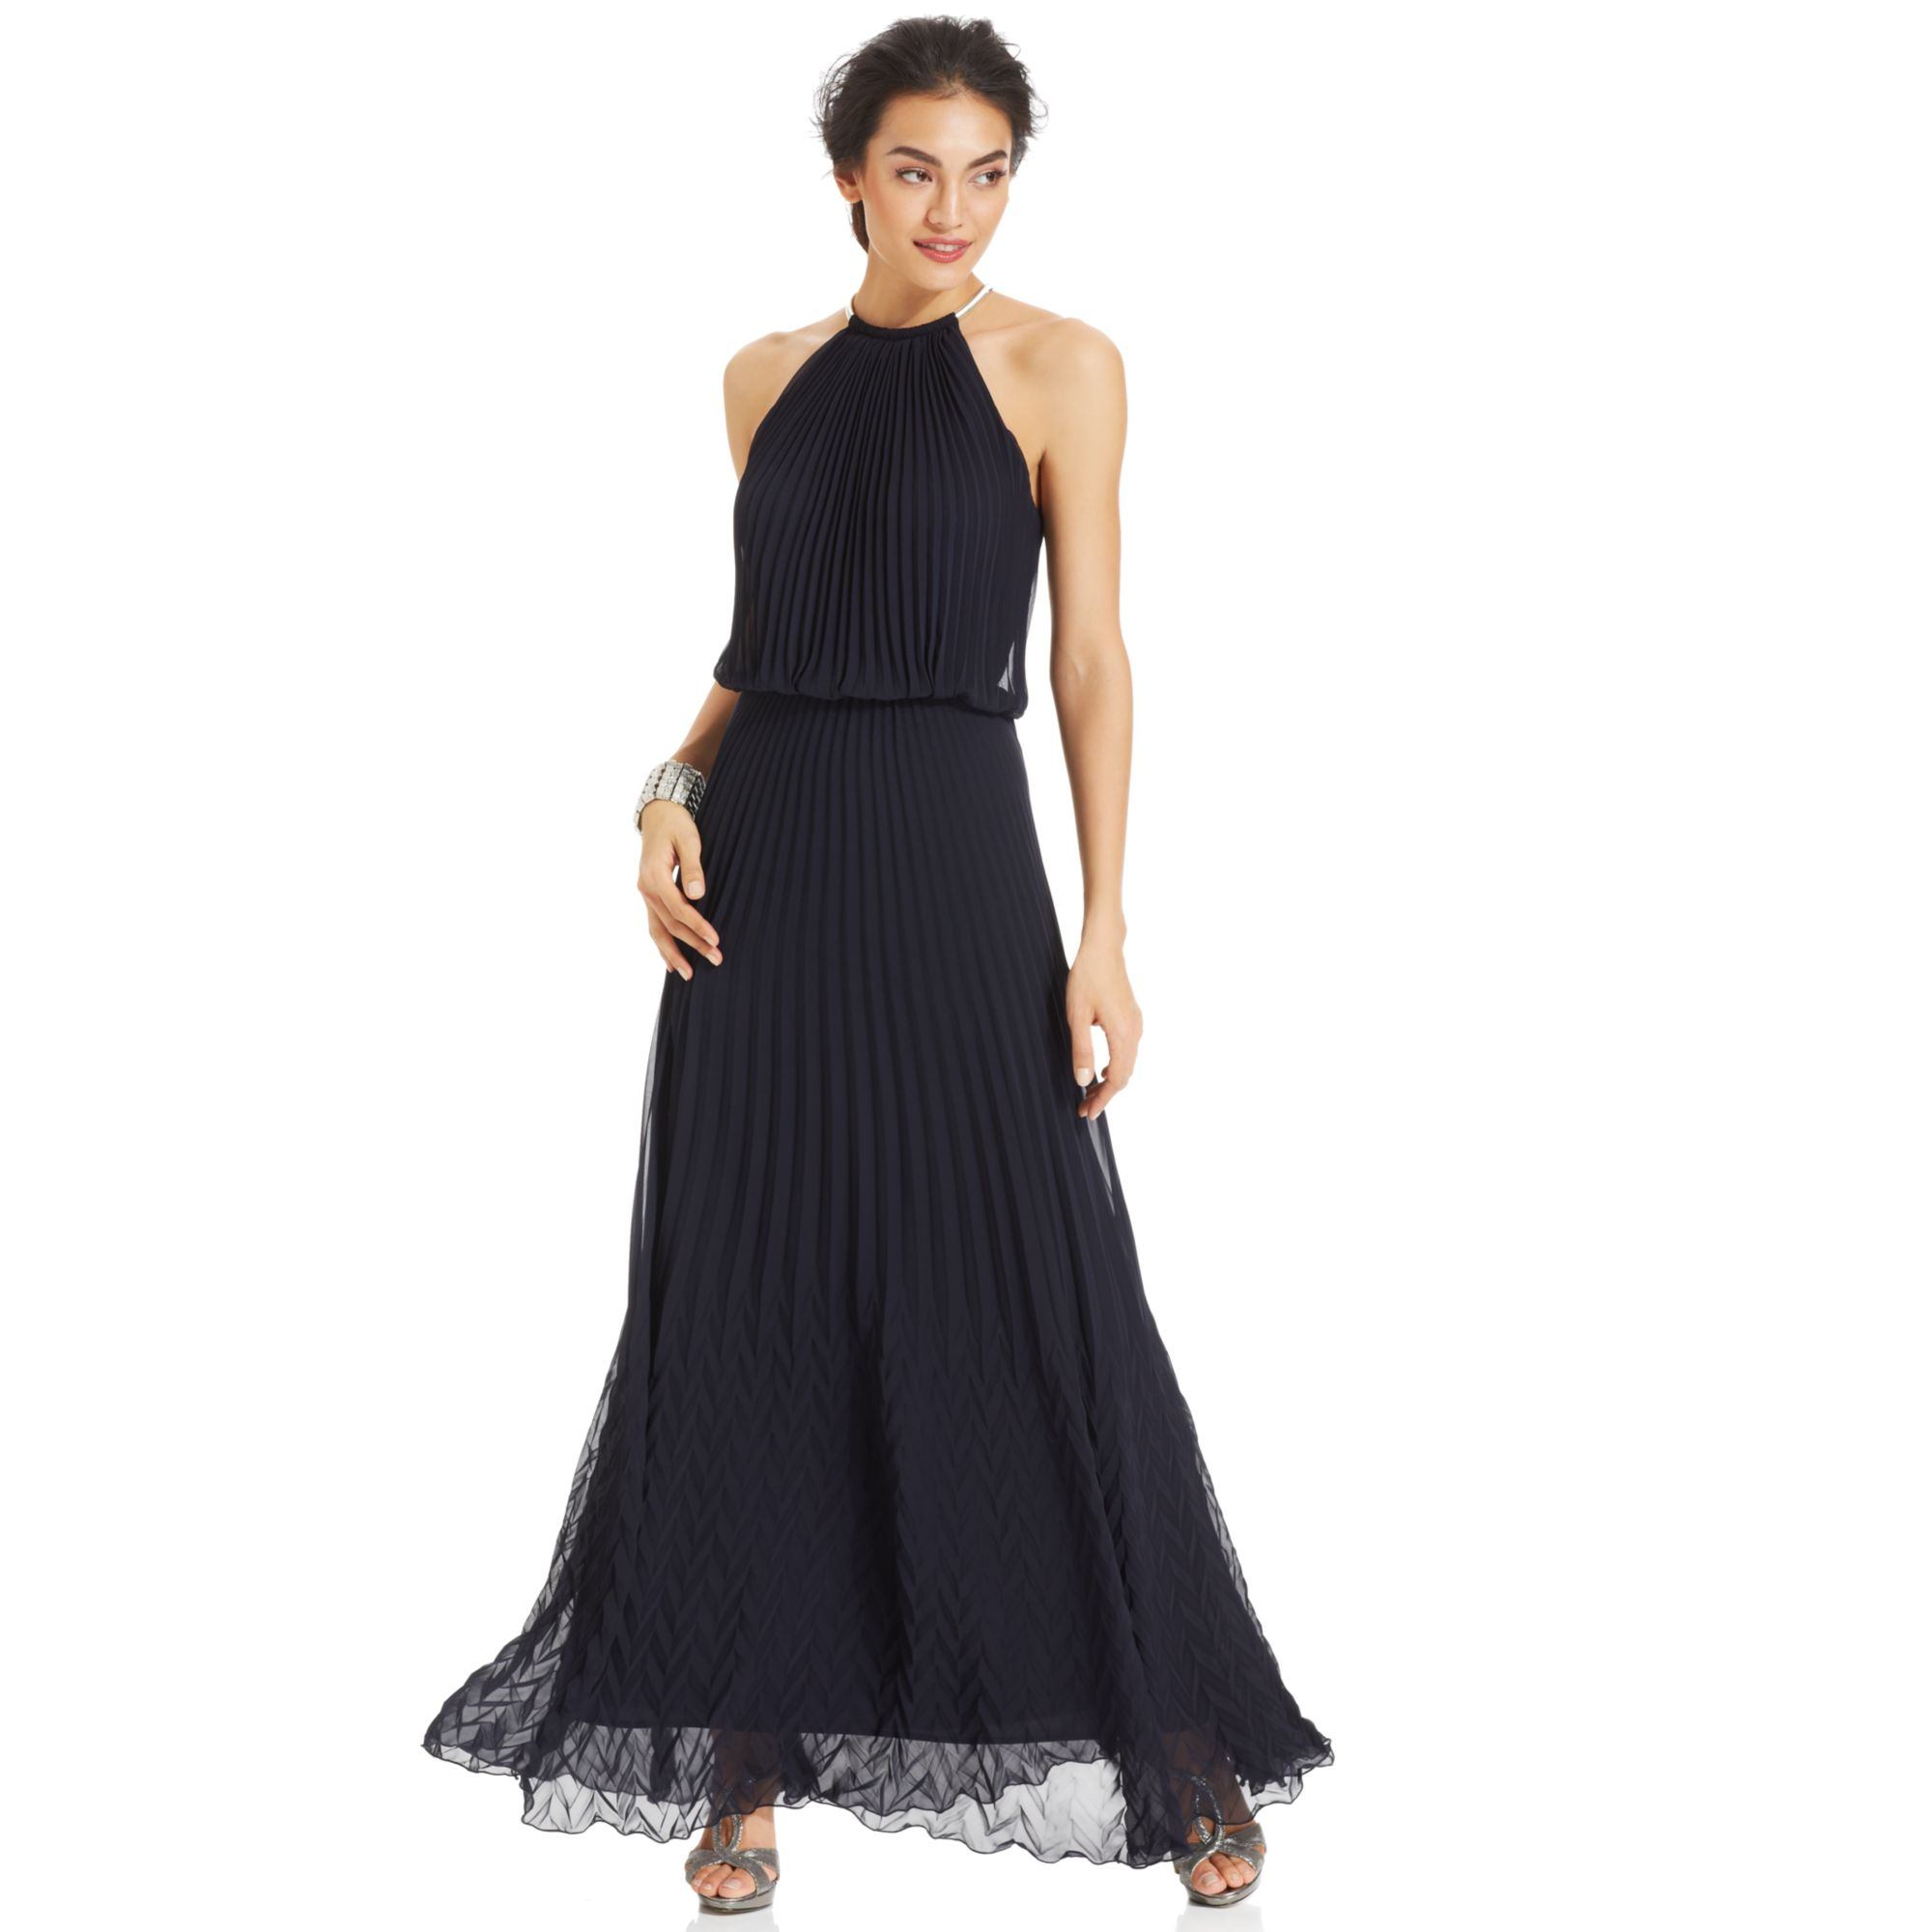 Lyst - Xscape Sleeveless Pleated Blouson Gown in Blue